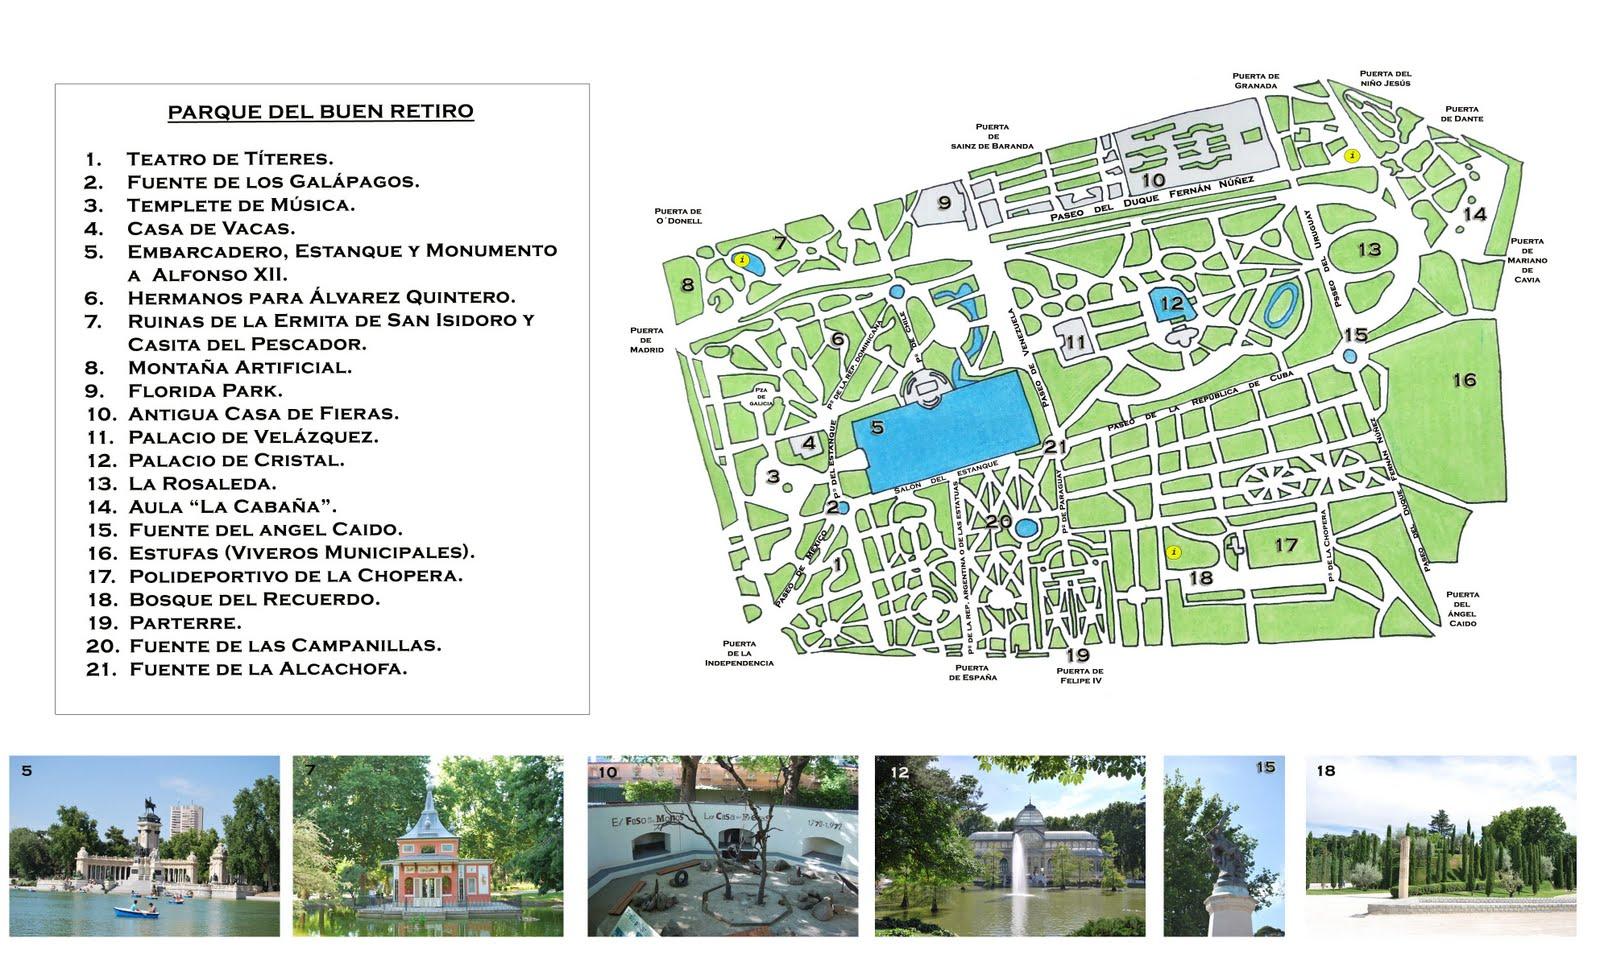 Plano Parque Del Retiro Mapa.El Parque Del Retiro De Madrid